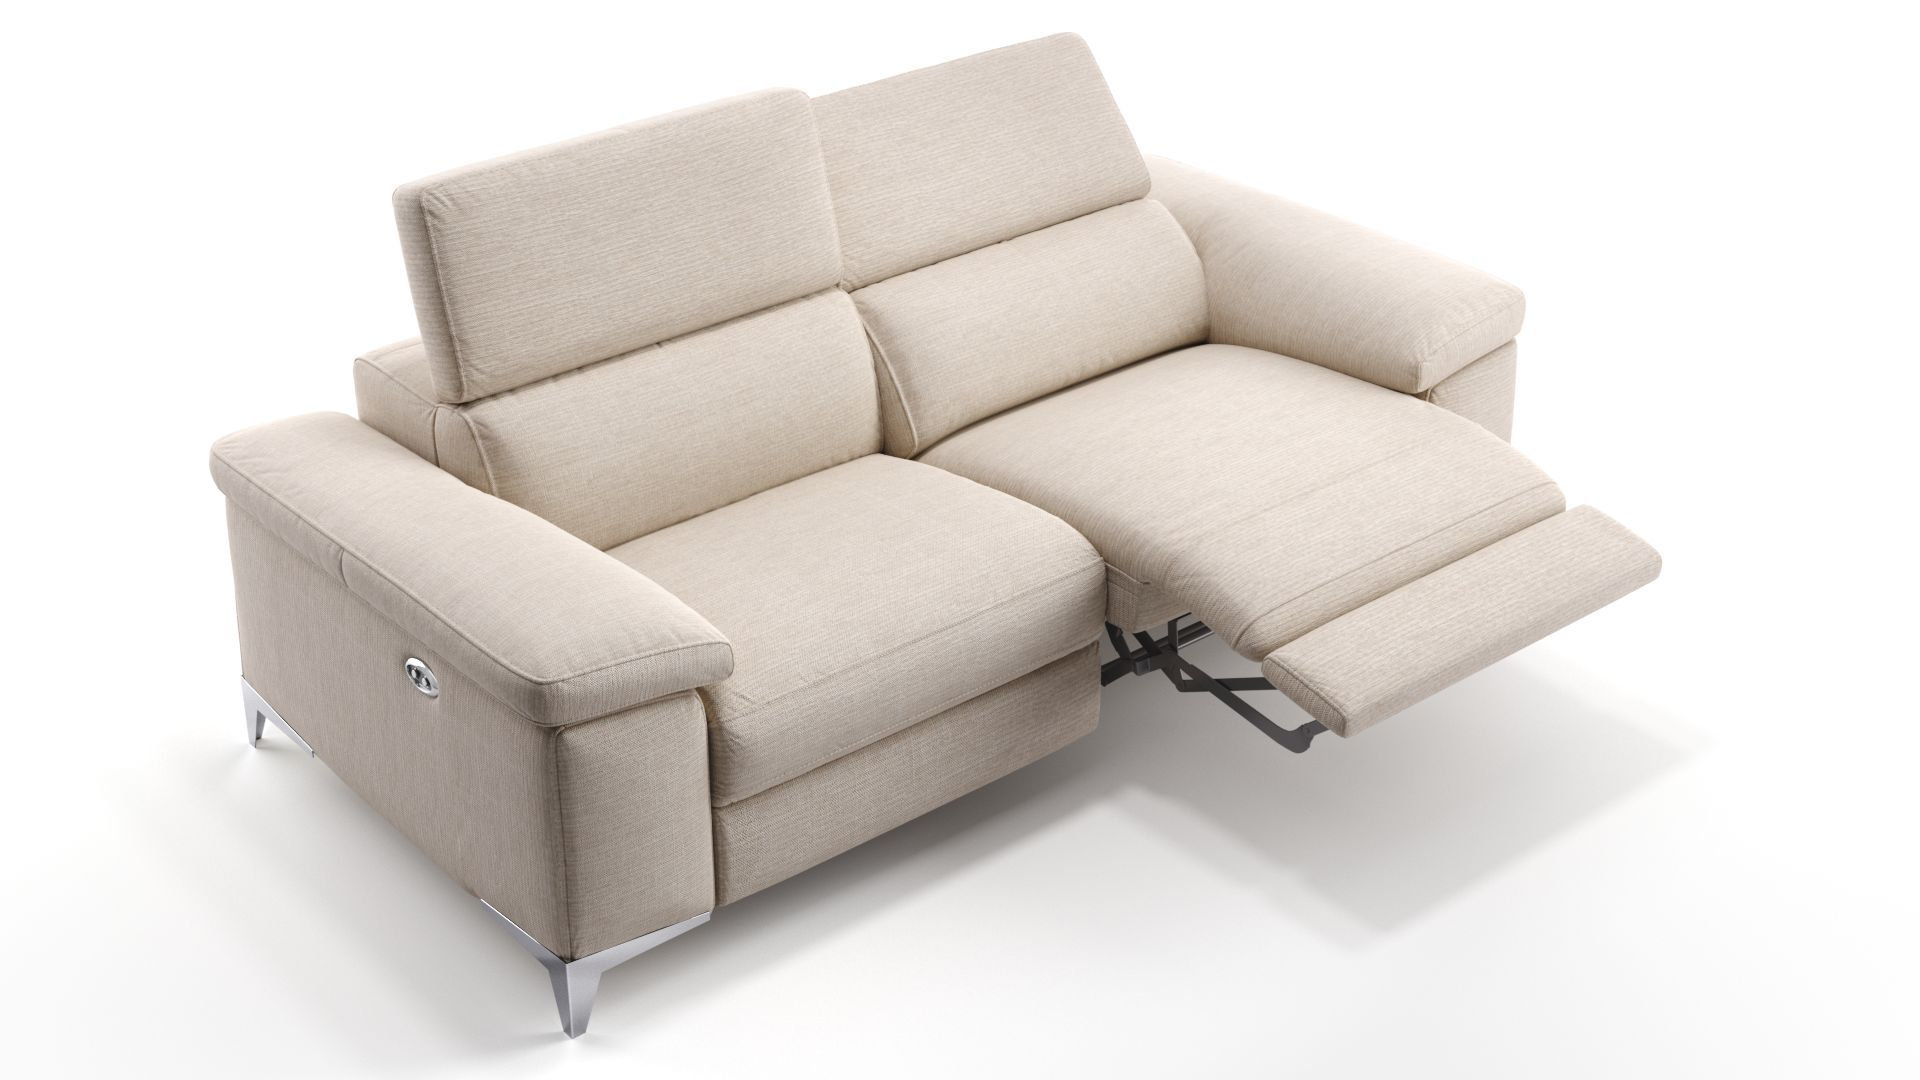 Venosa Stoff Garnitur Sofa Mit Relaxfunktion Sofa Stoff Sofa